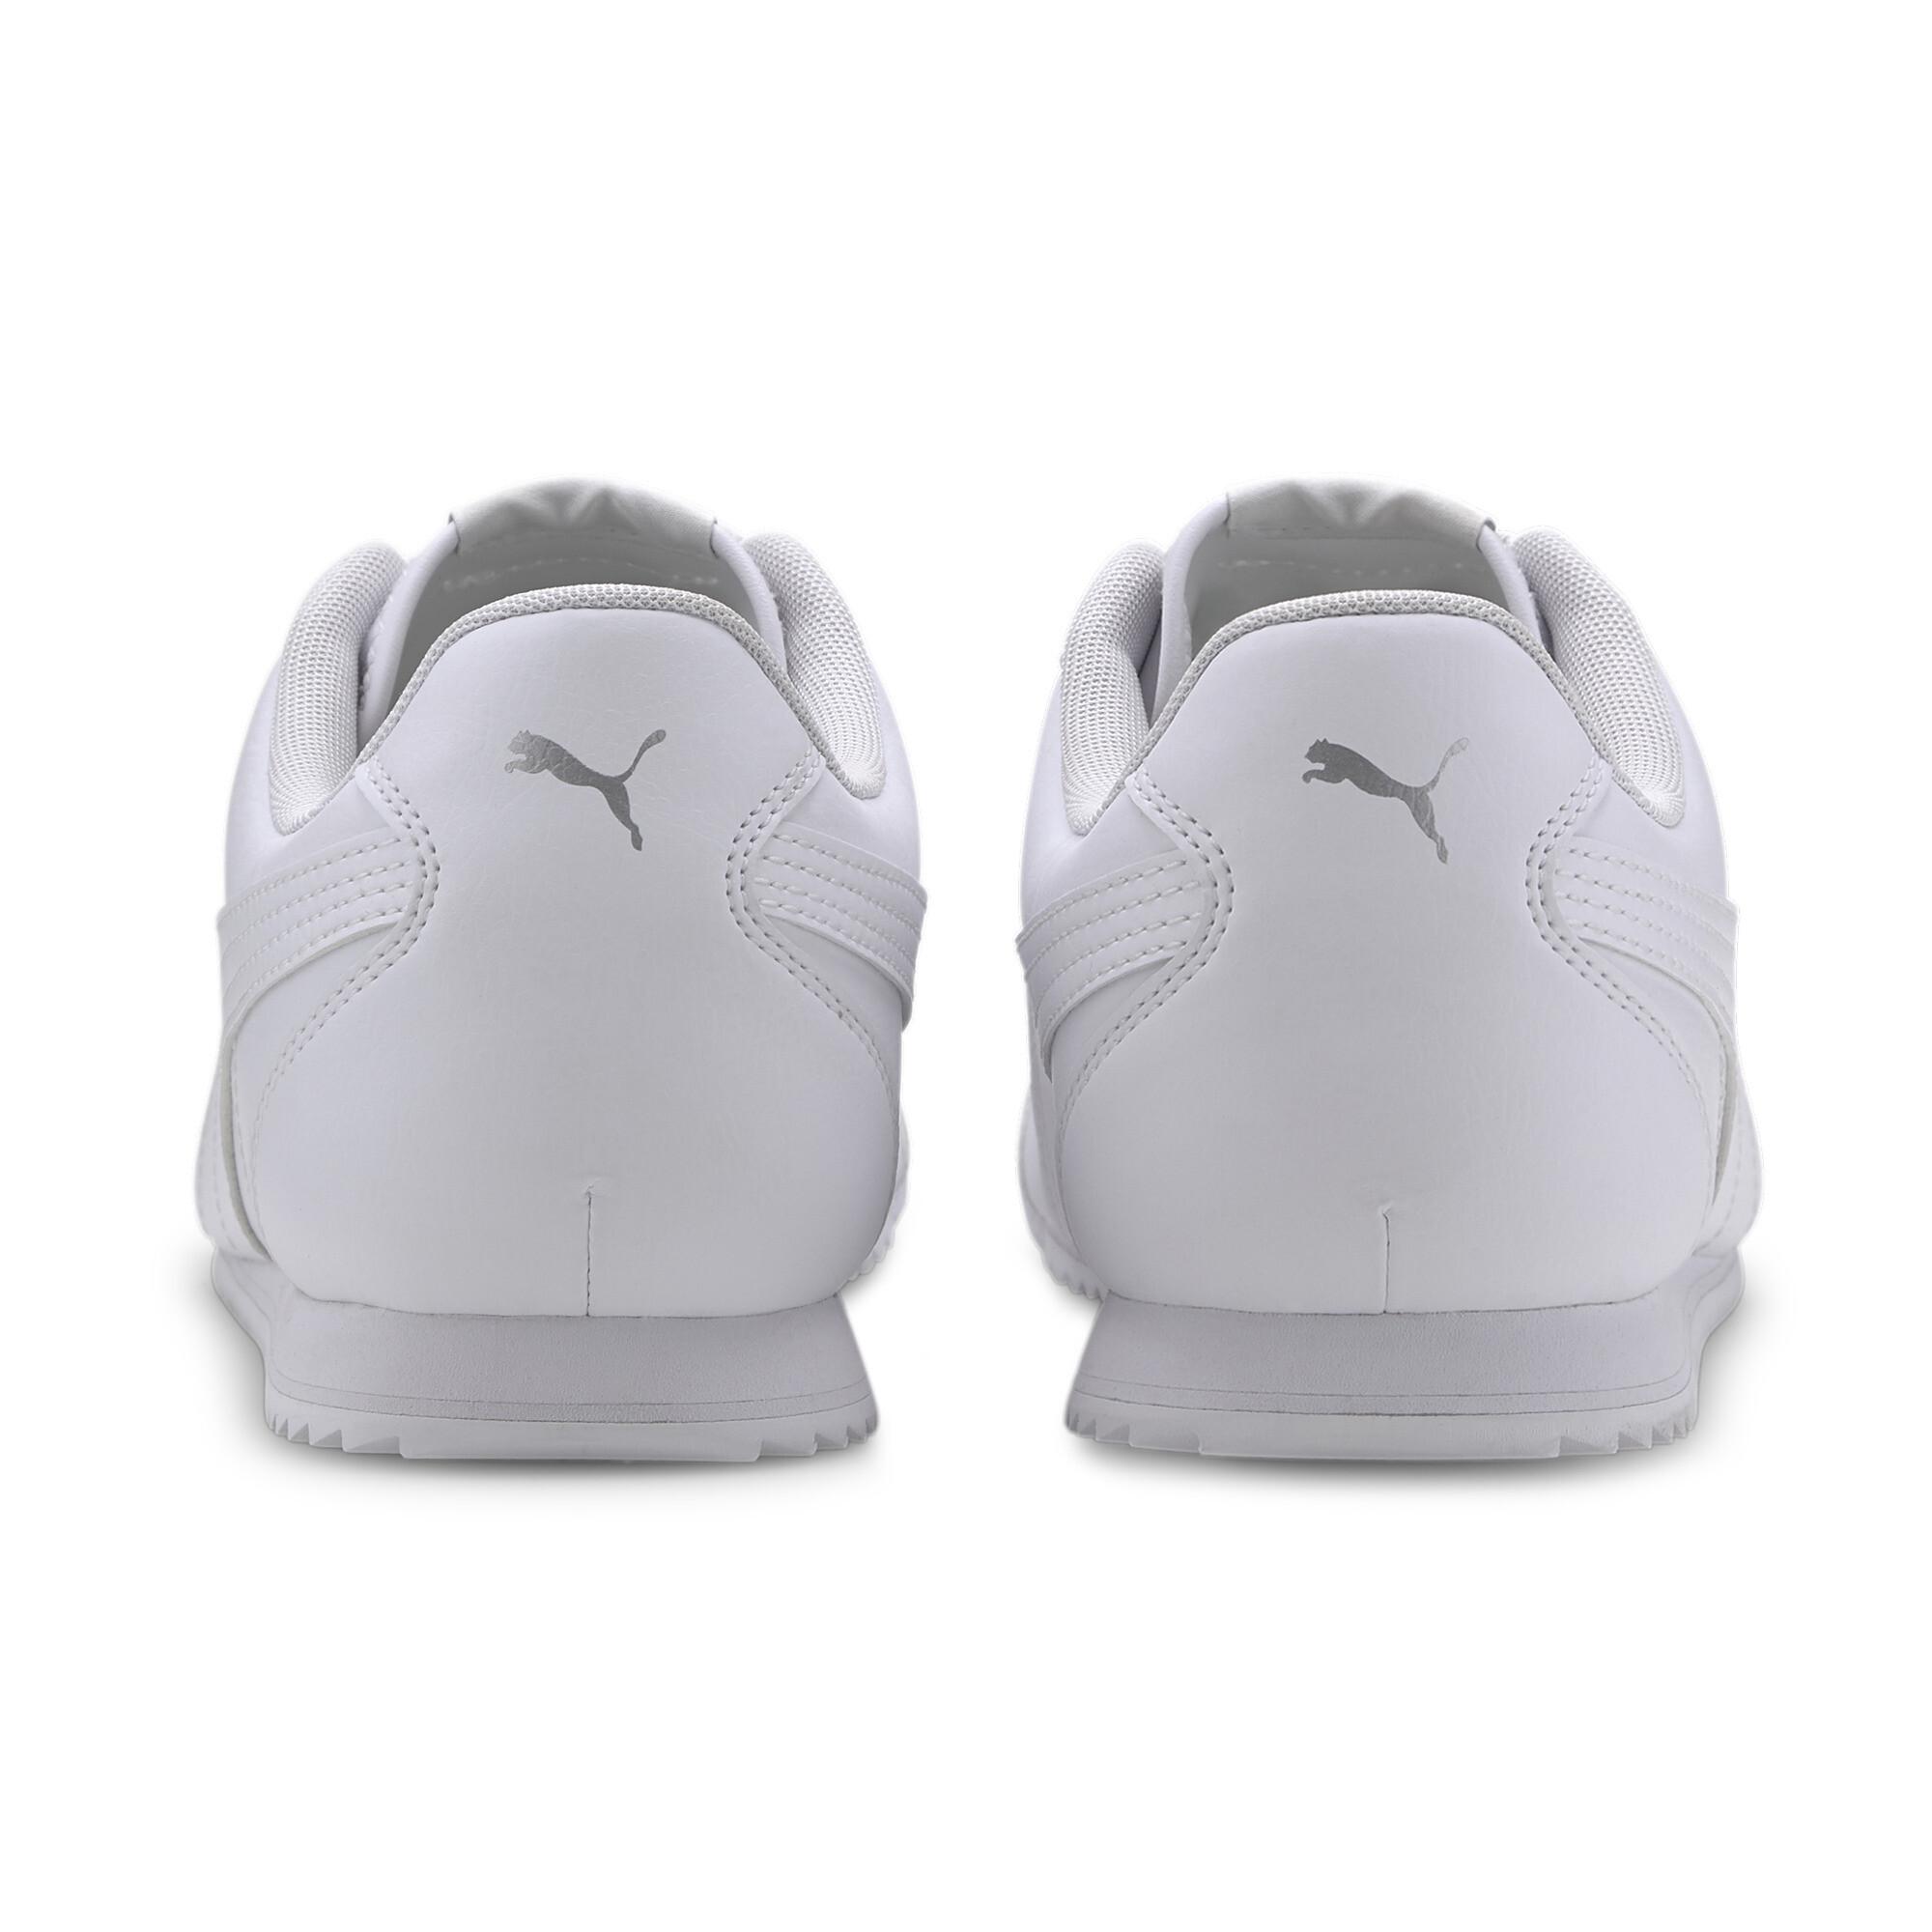 PUMA-Men-039-s-Turino-SL-Sneakers thumbnail 3